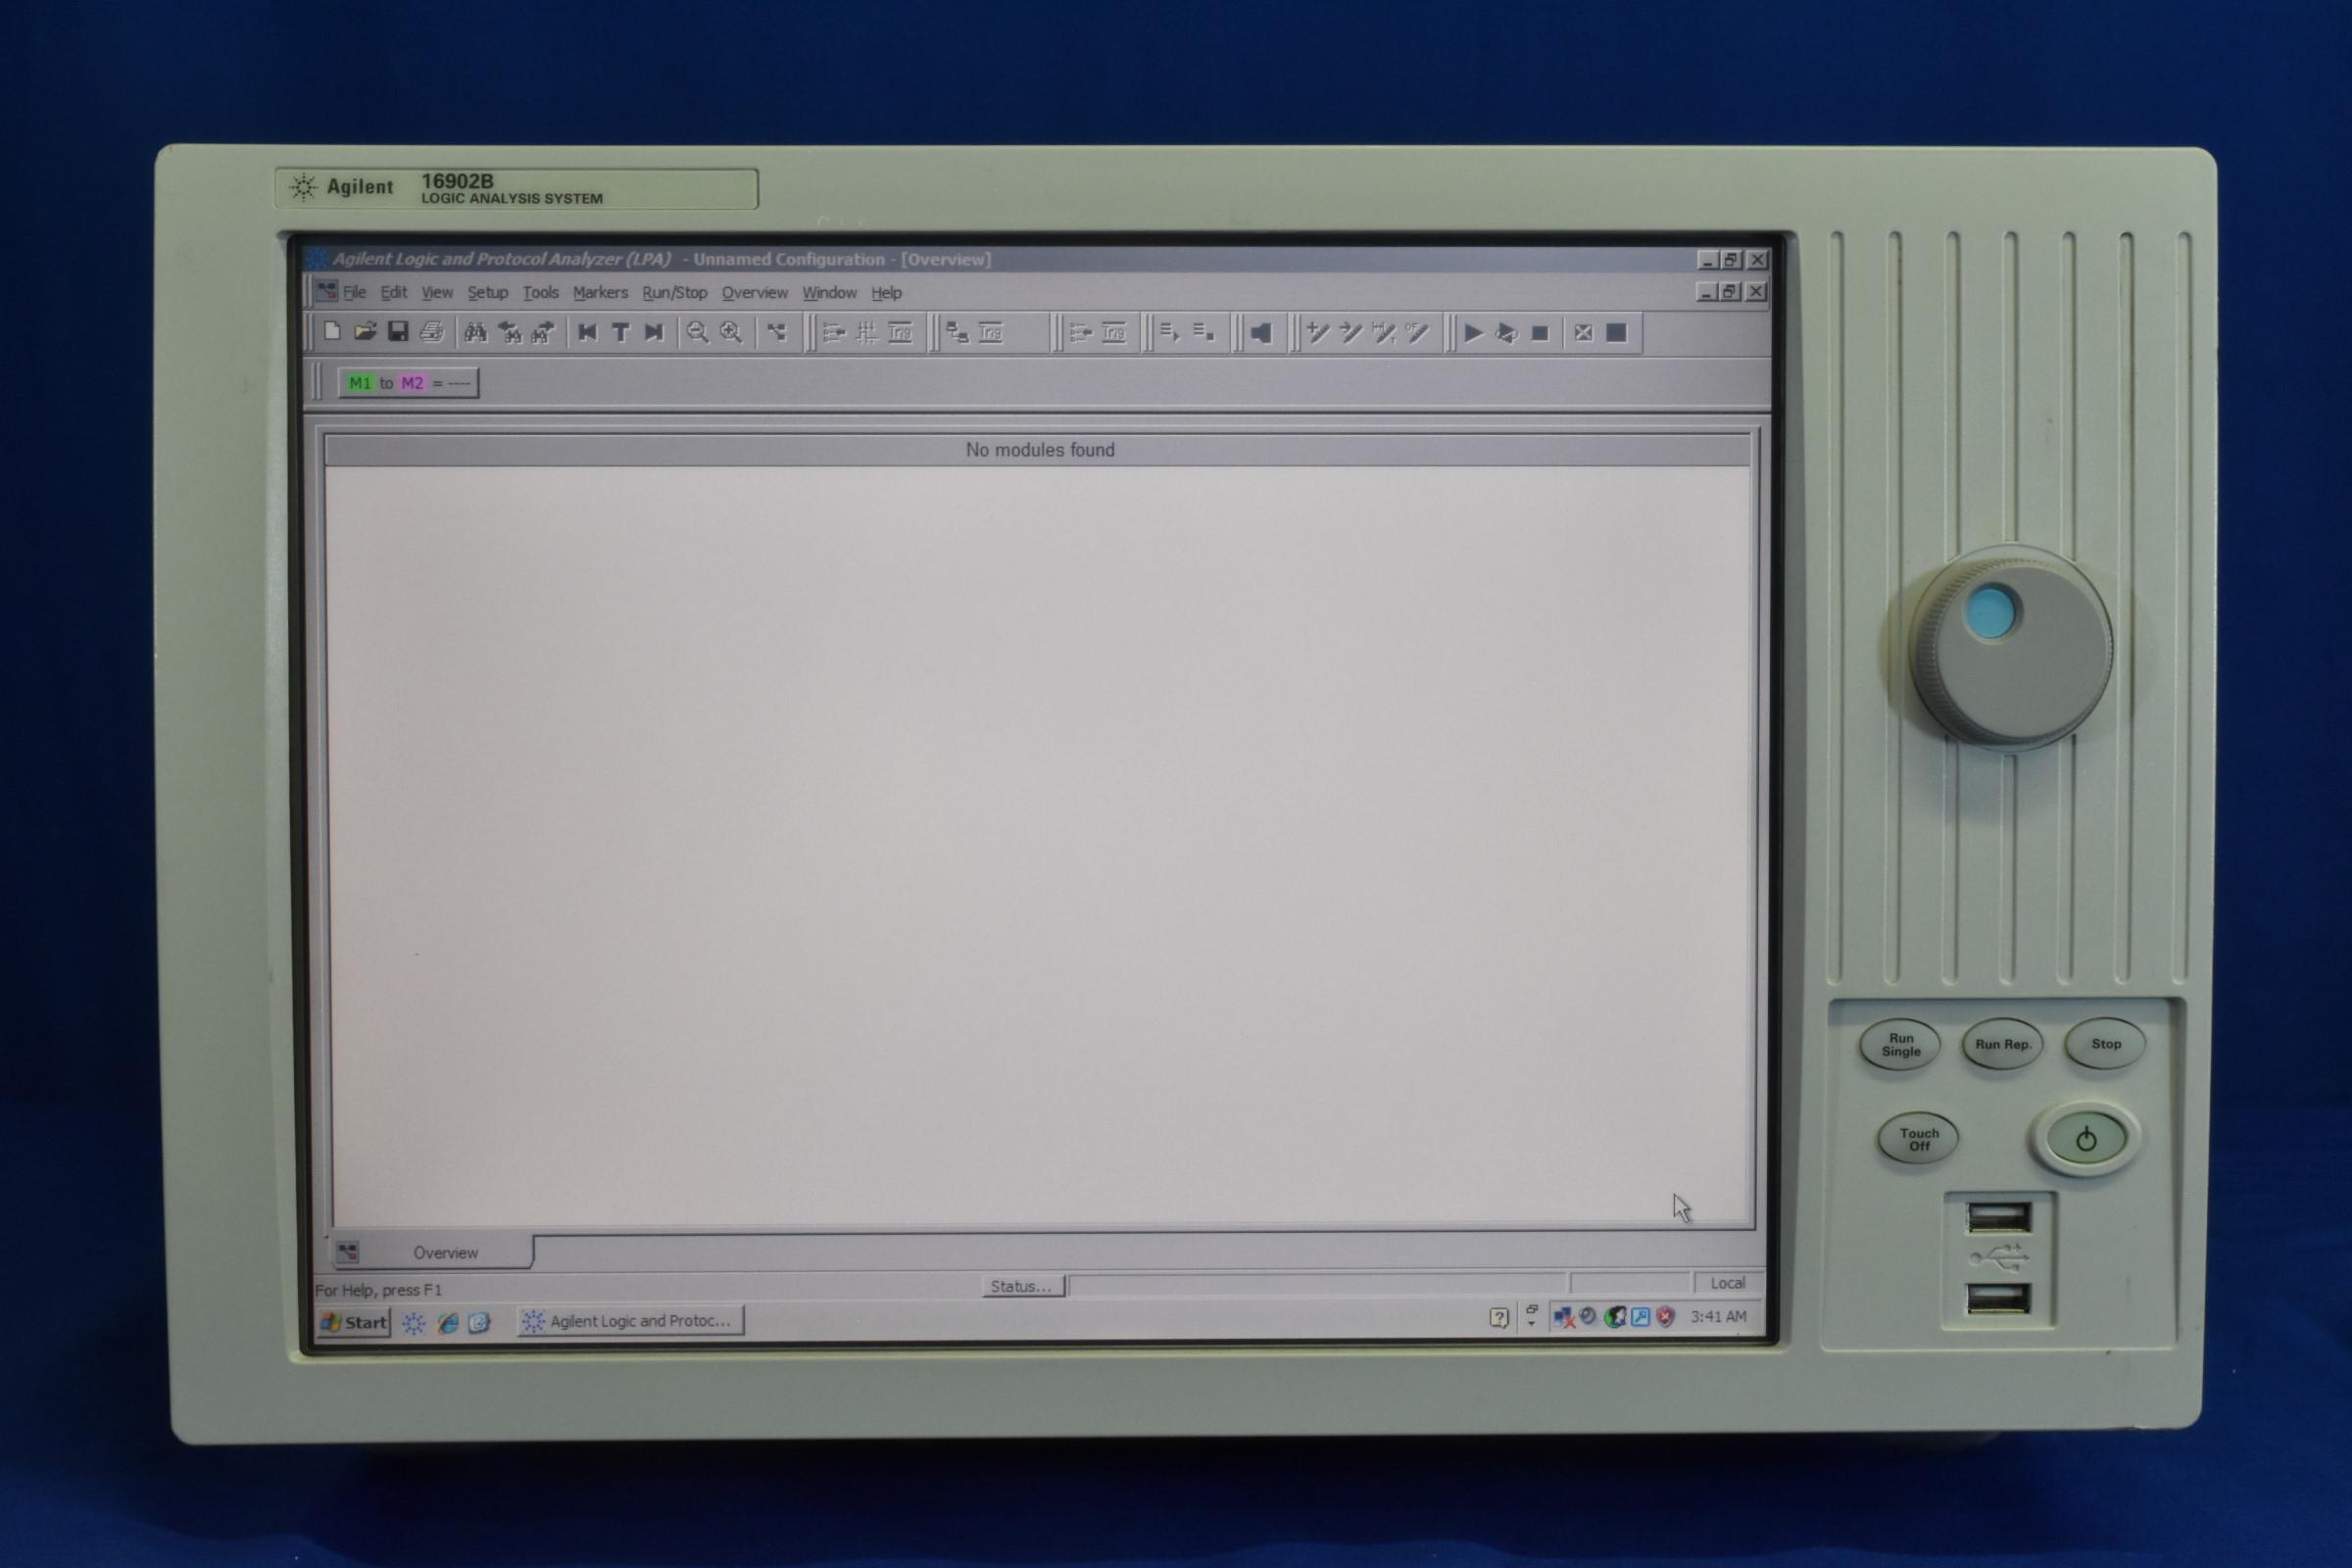 SN 482_001